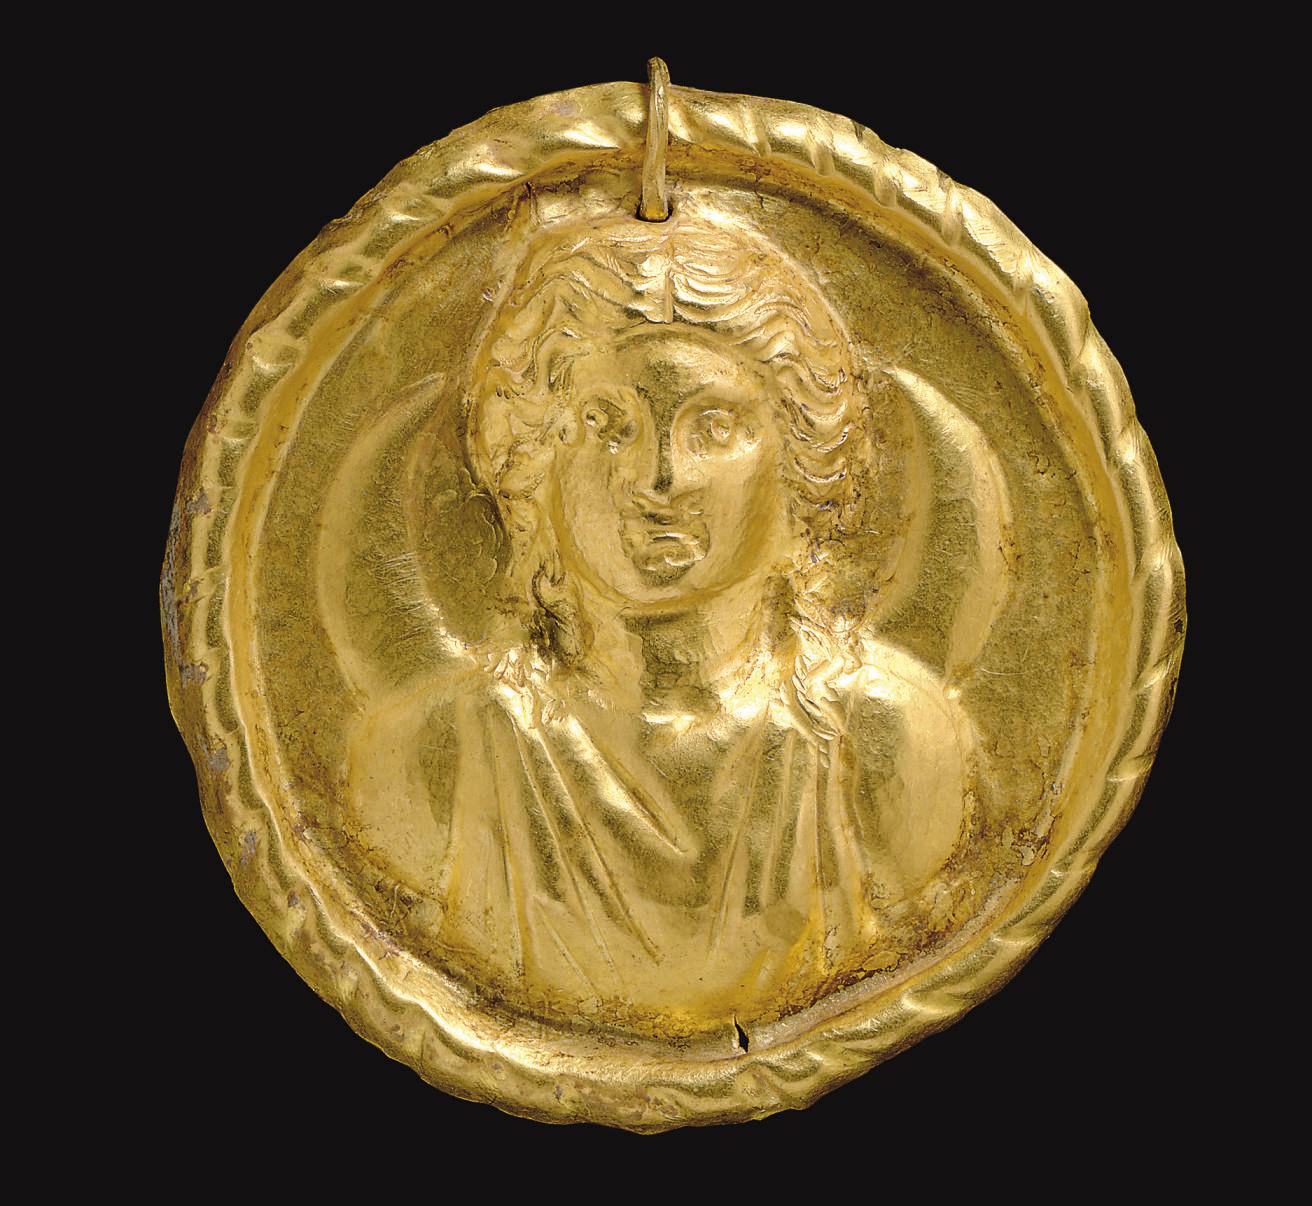 A ROMAN GOLD MEDALLION OF LUNA